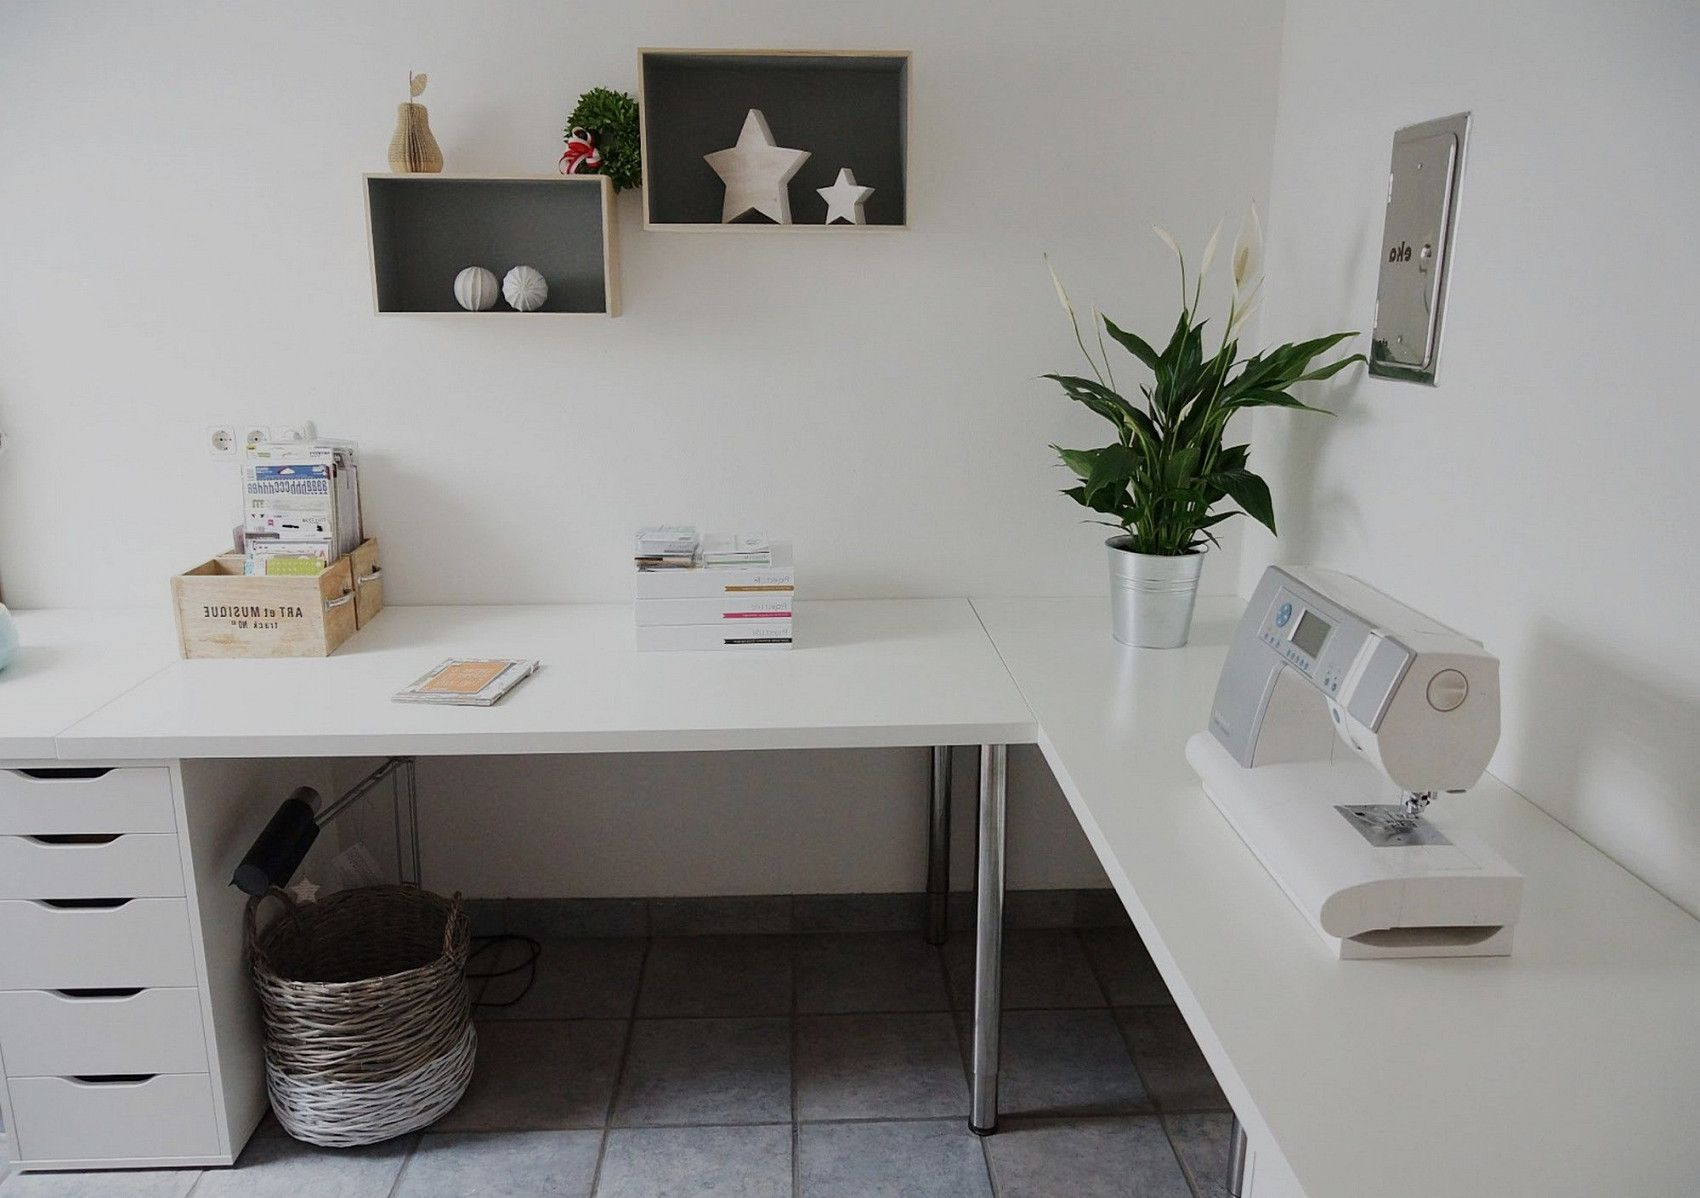 Image Result For Ikea Linnmon Desk Ideas Ikea L Shaped Desk Ikea Linnmon Desk L Shaped Desk